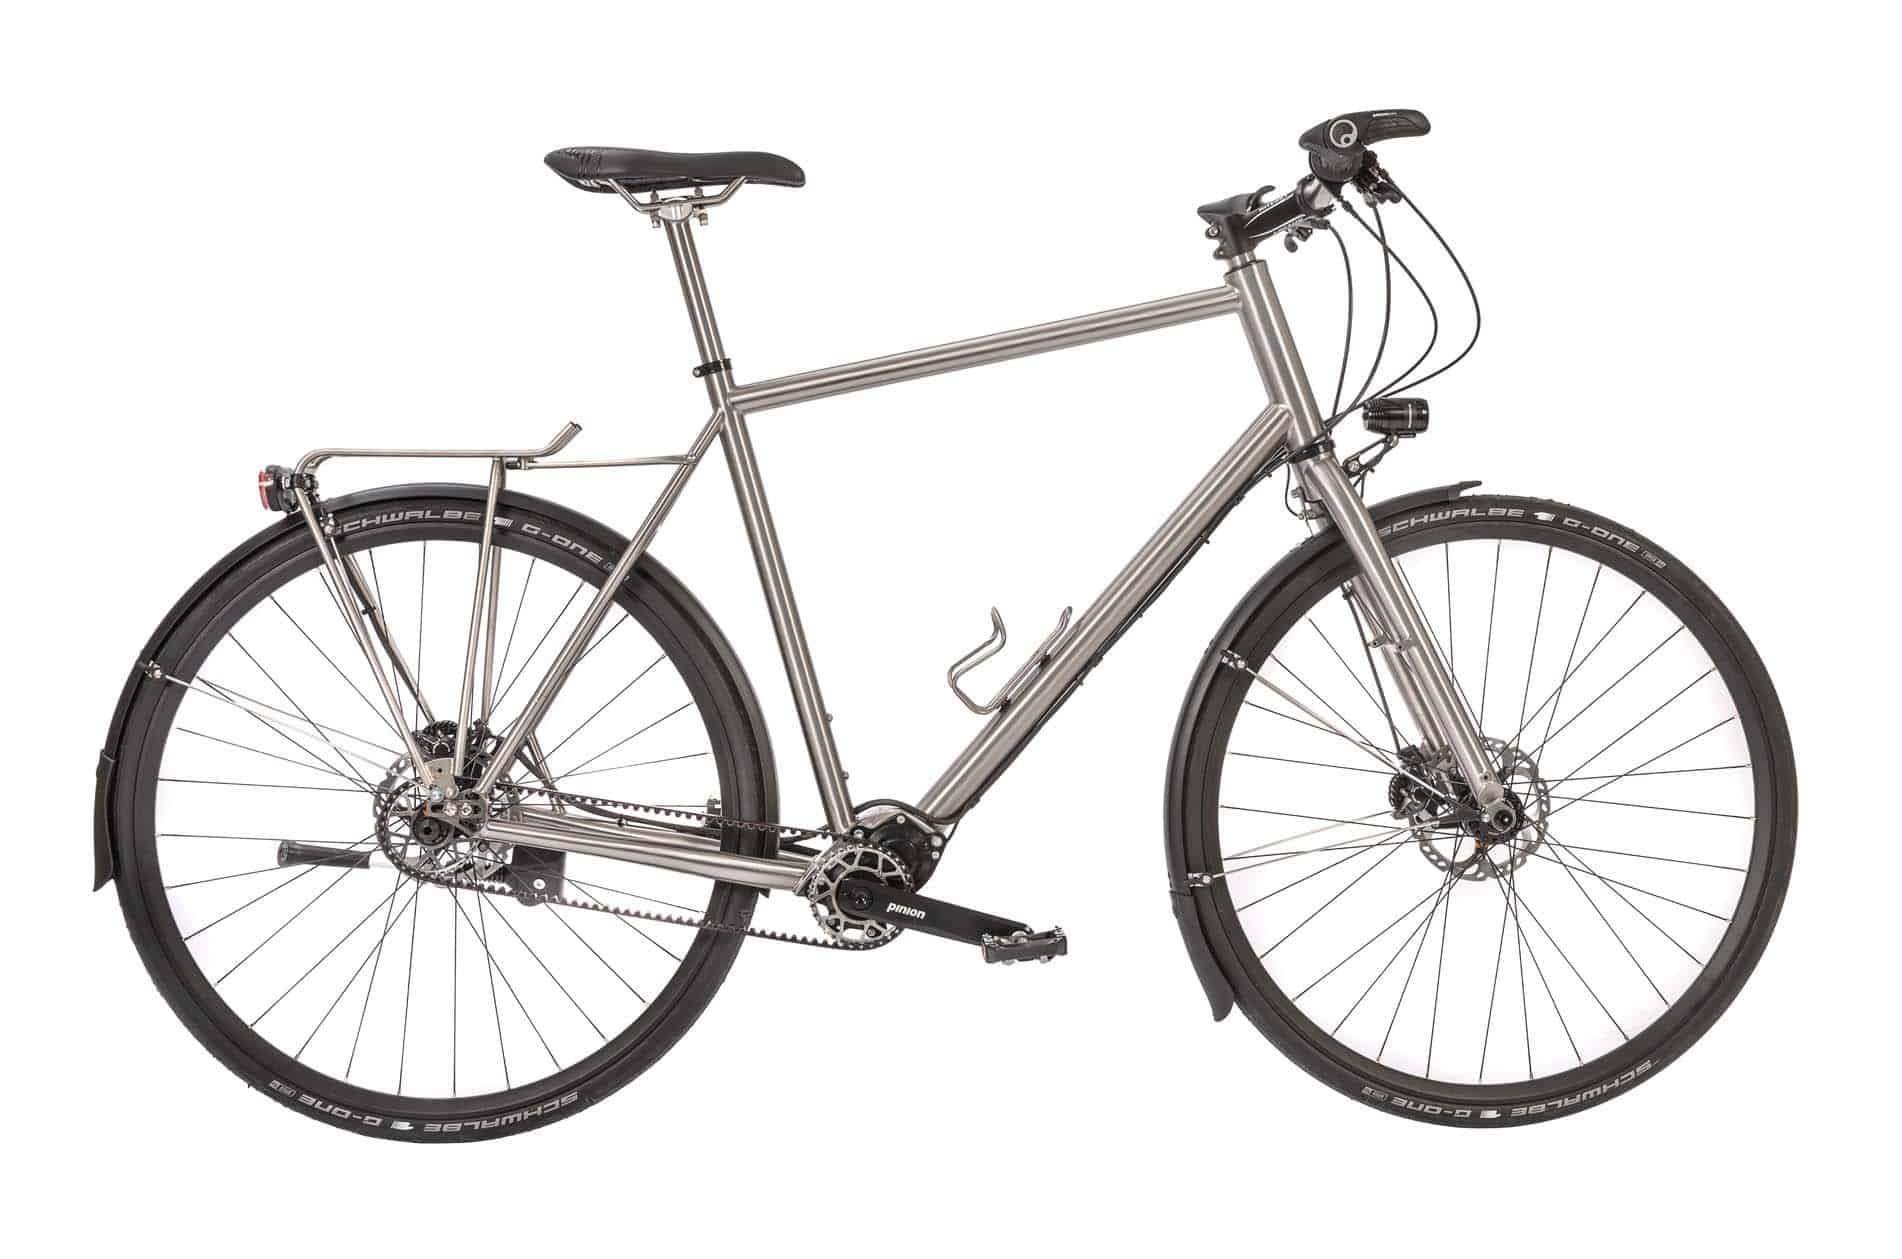 Urban_Pinion_Bike_01_min